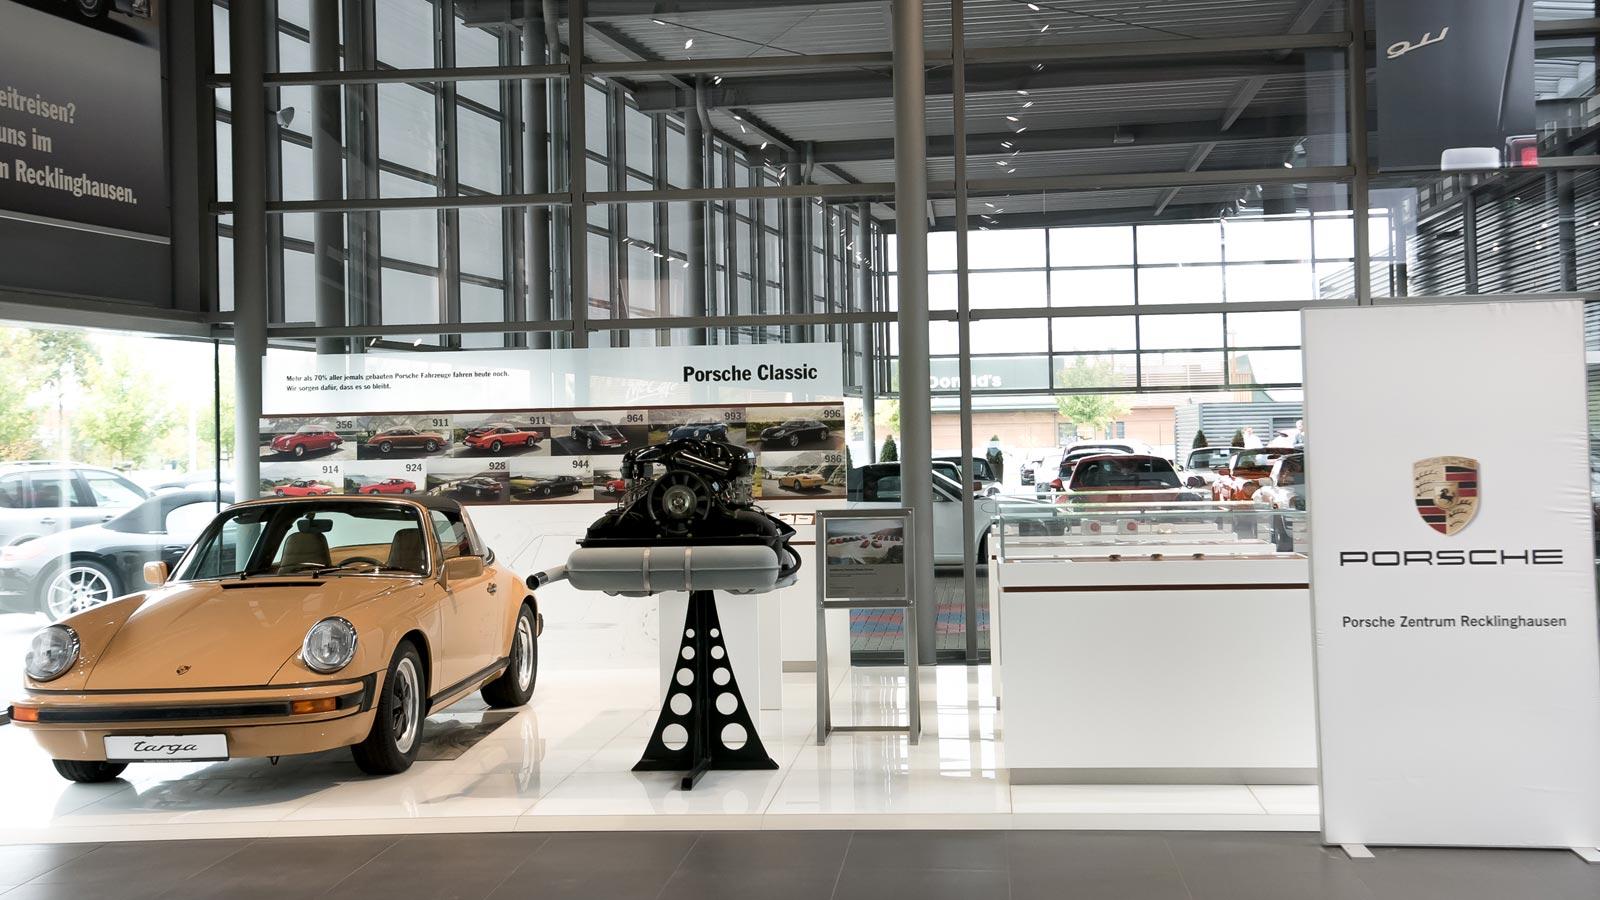 Porsche - Порше Центр Реклингхаузен